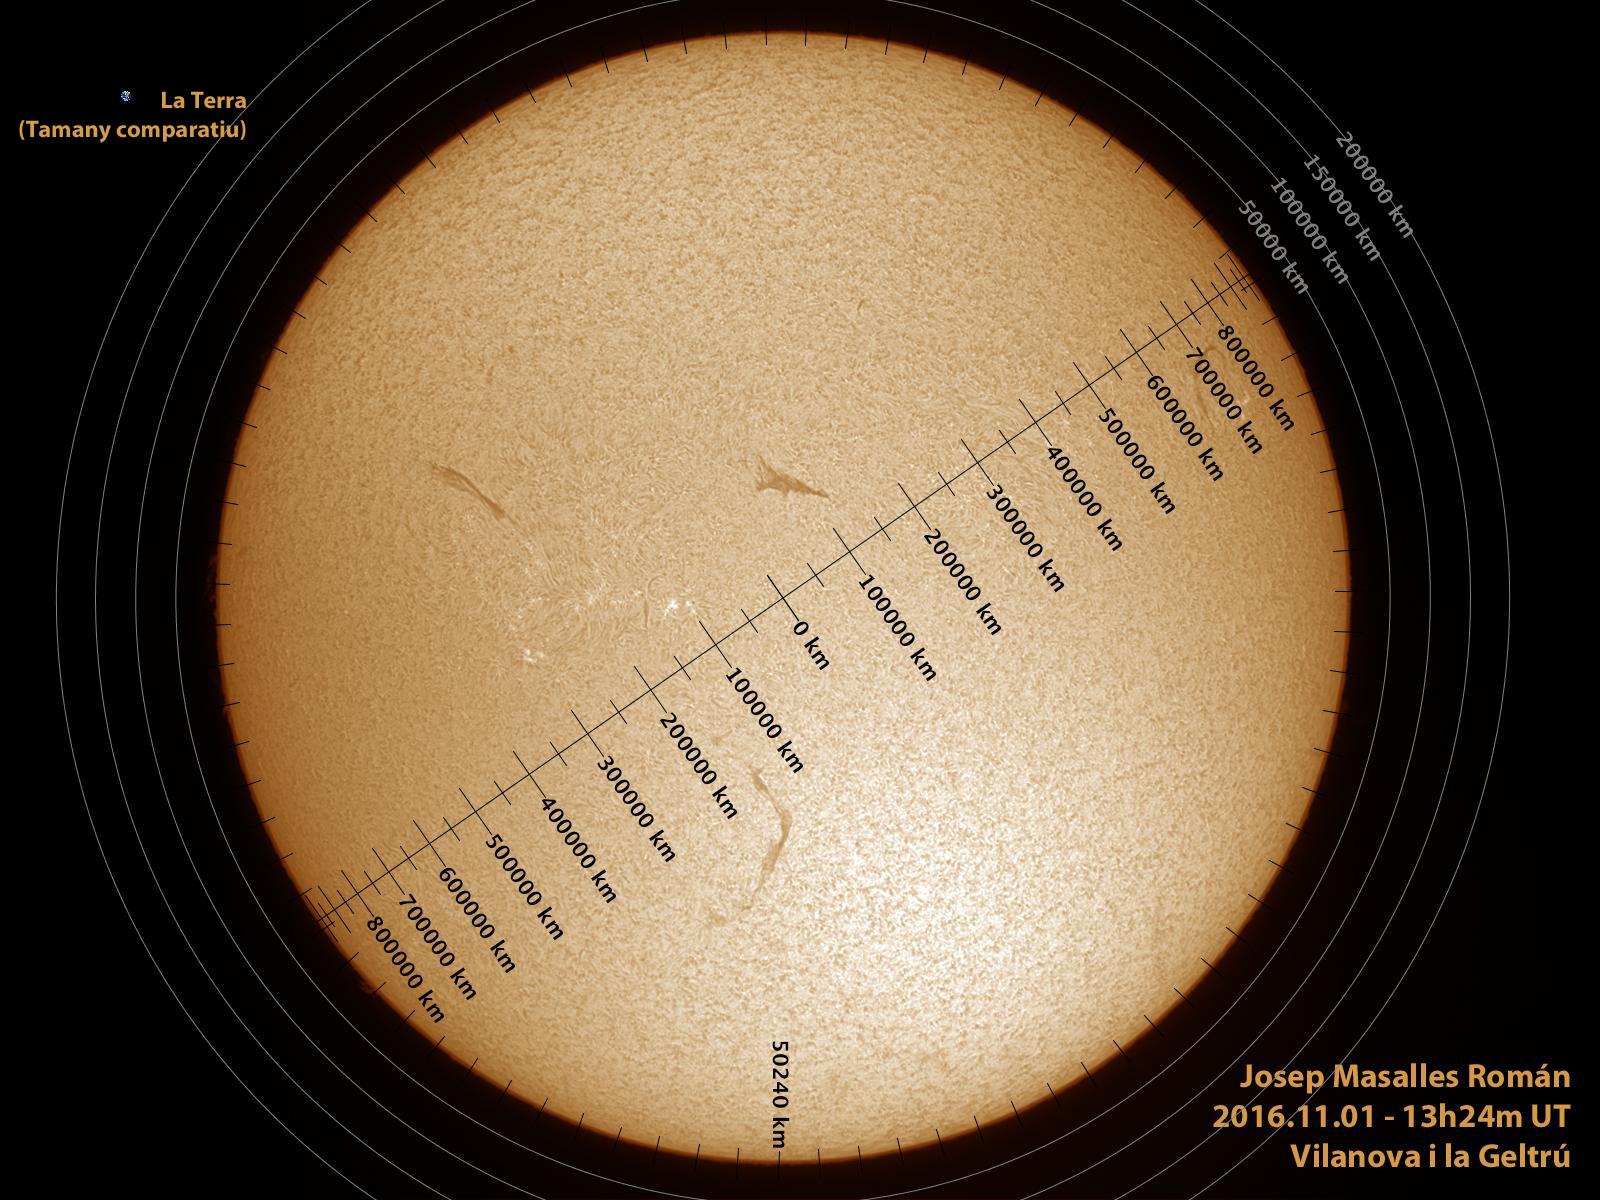 20161101-sol-h-alpha-13h24mut-jmr2ct